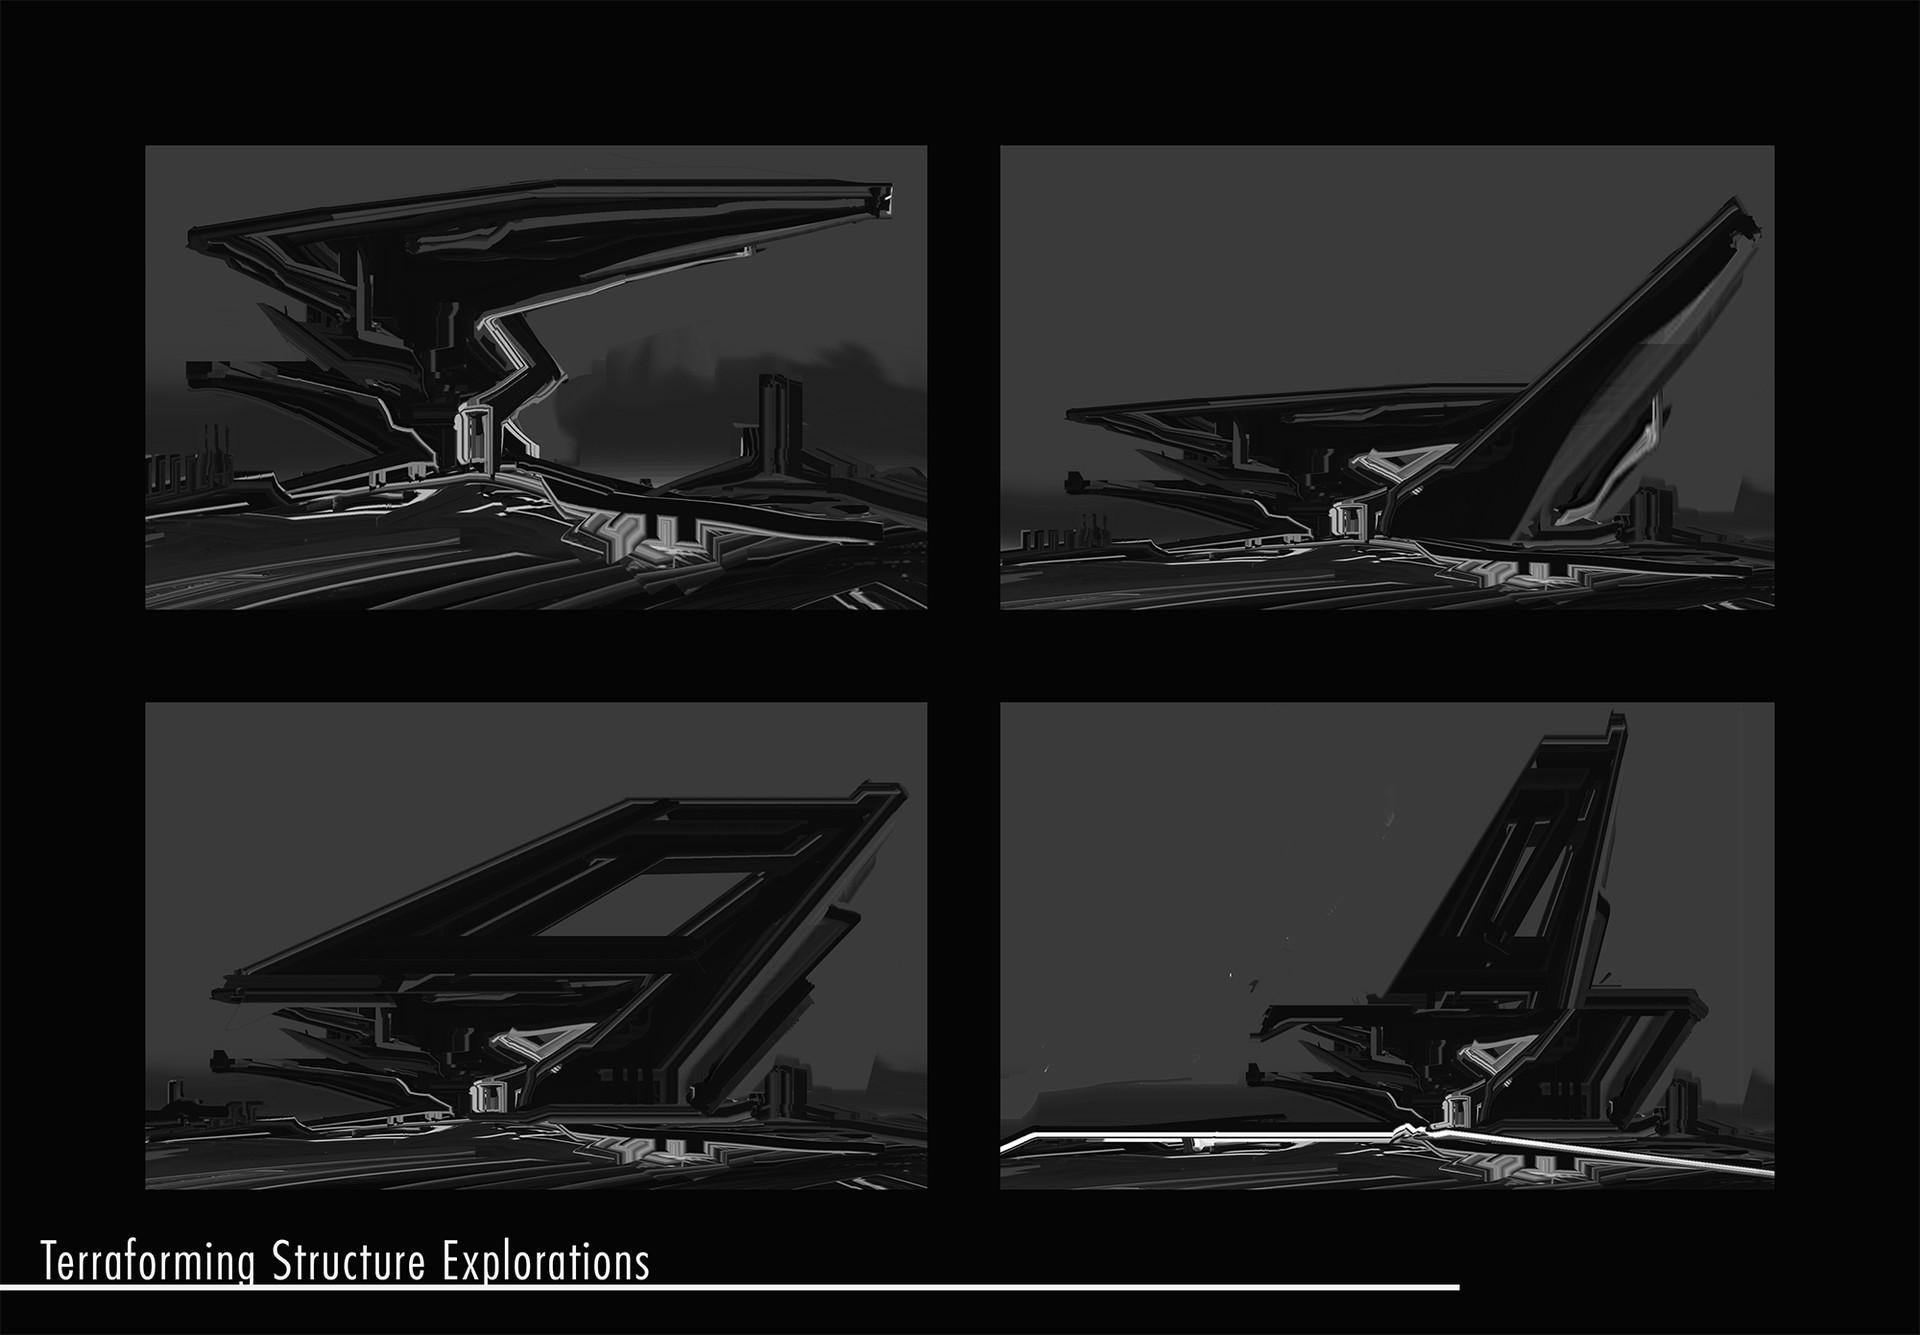 Shape explorations for terraforming machine